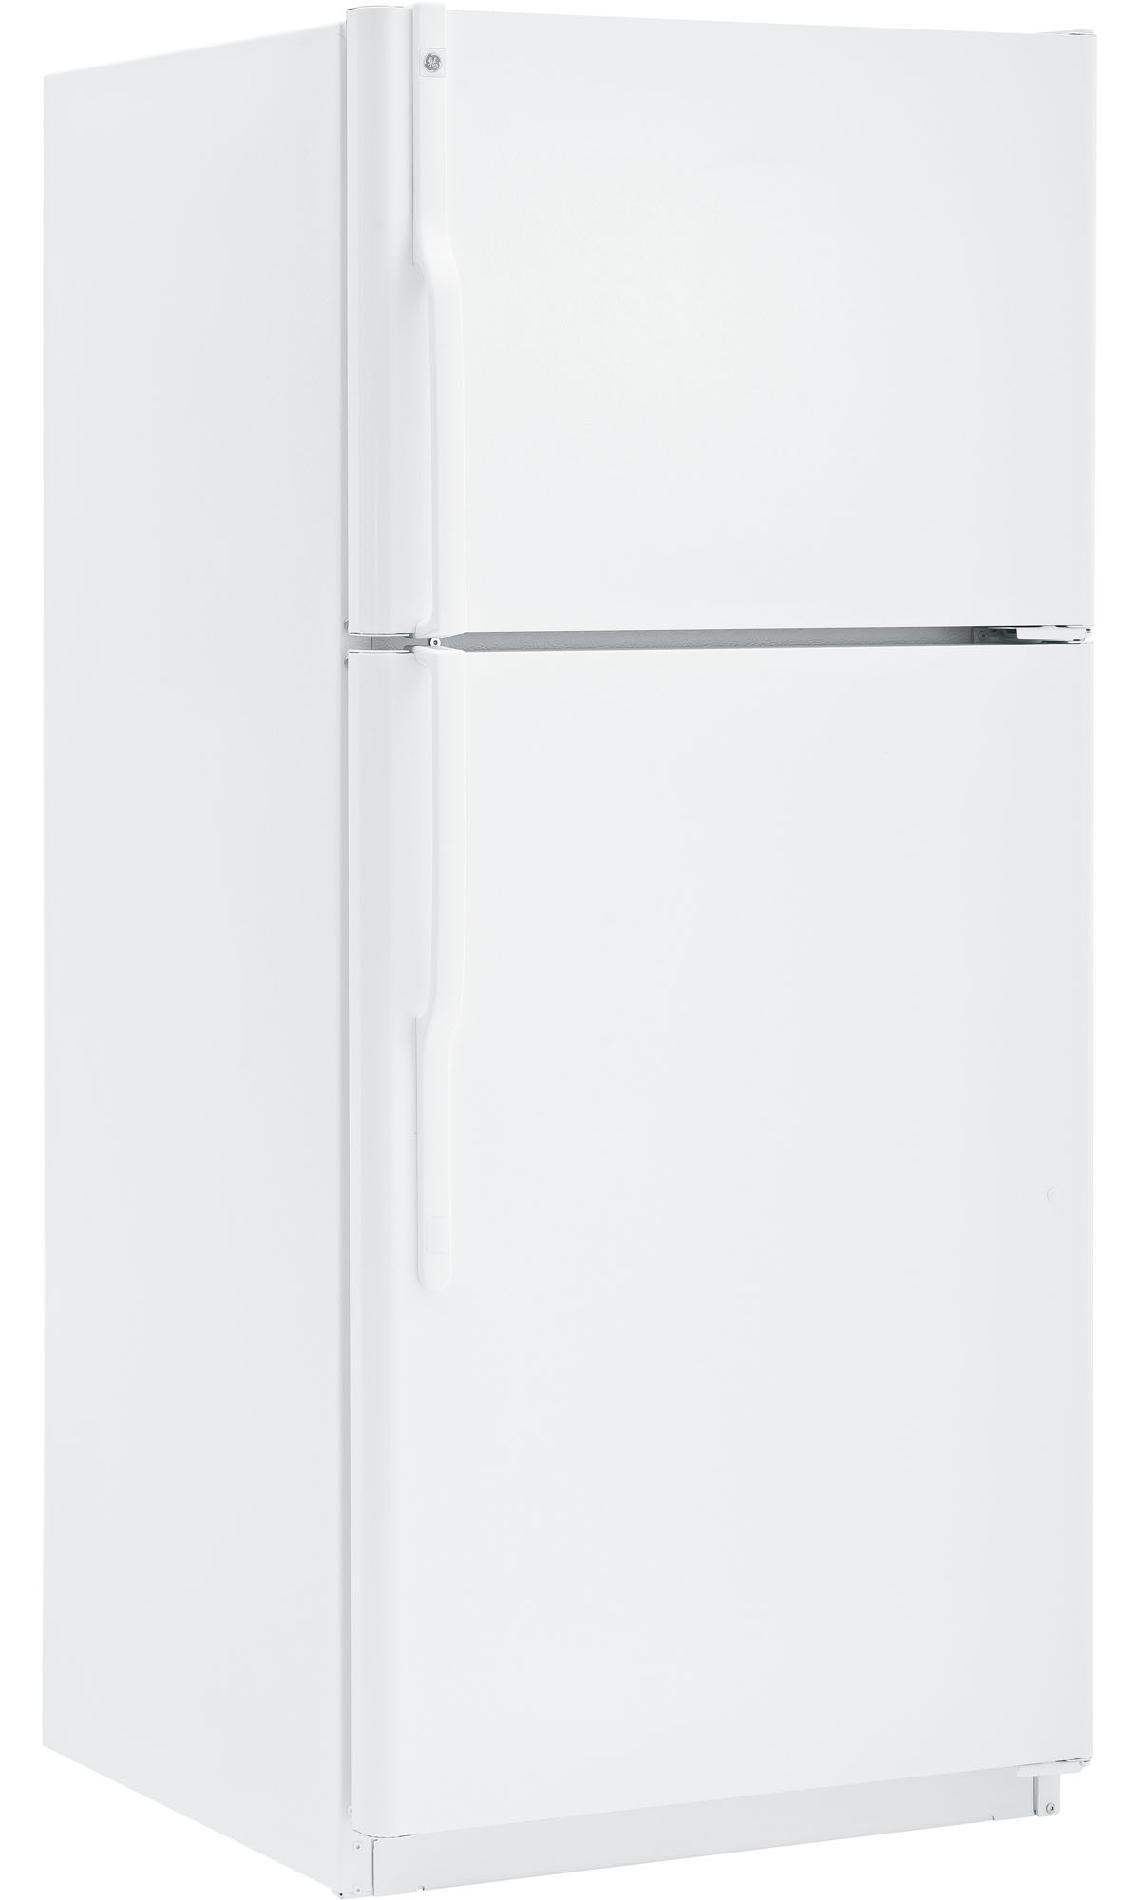 GE 18 cu. ft. Top-Freezer Refrigerator  - White